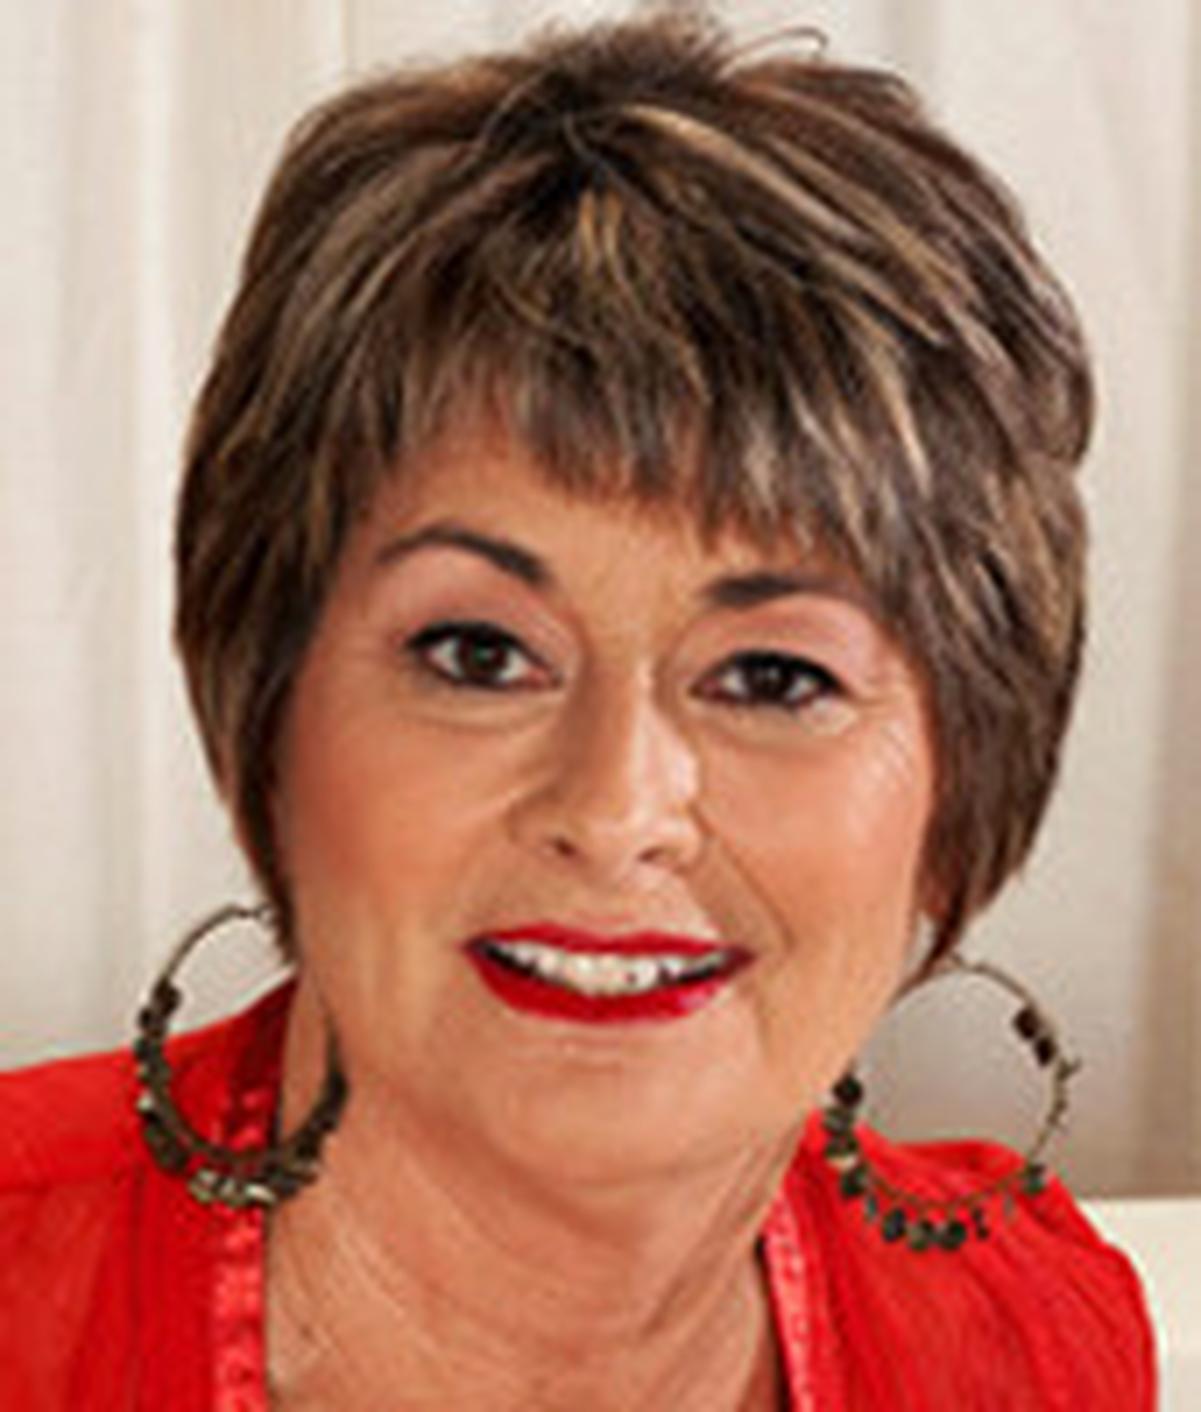 Victoria Peale